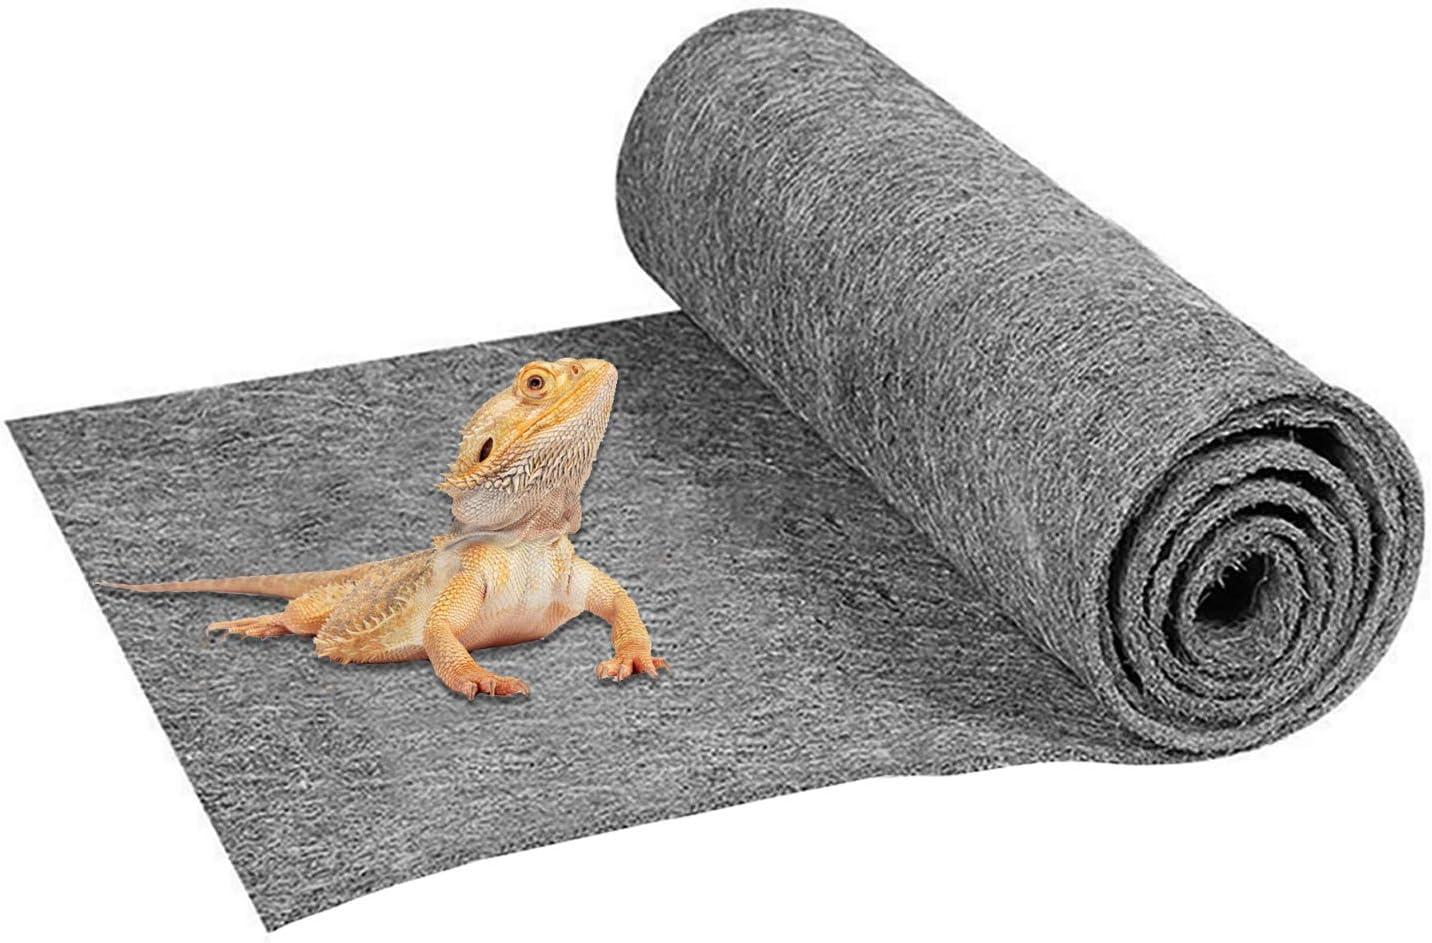 Mechpia 47'' x 23'' Large Ranking TOP4 Carpet Terrarium Bedding Liner online shopping Reptile